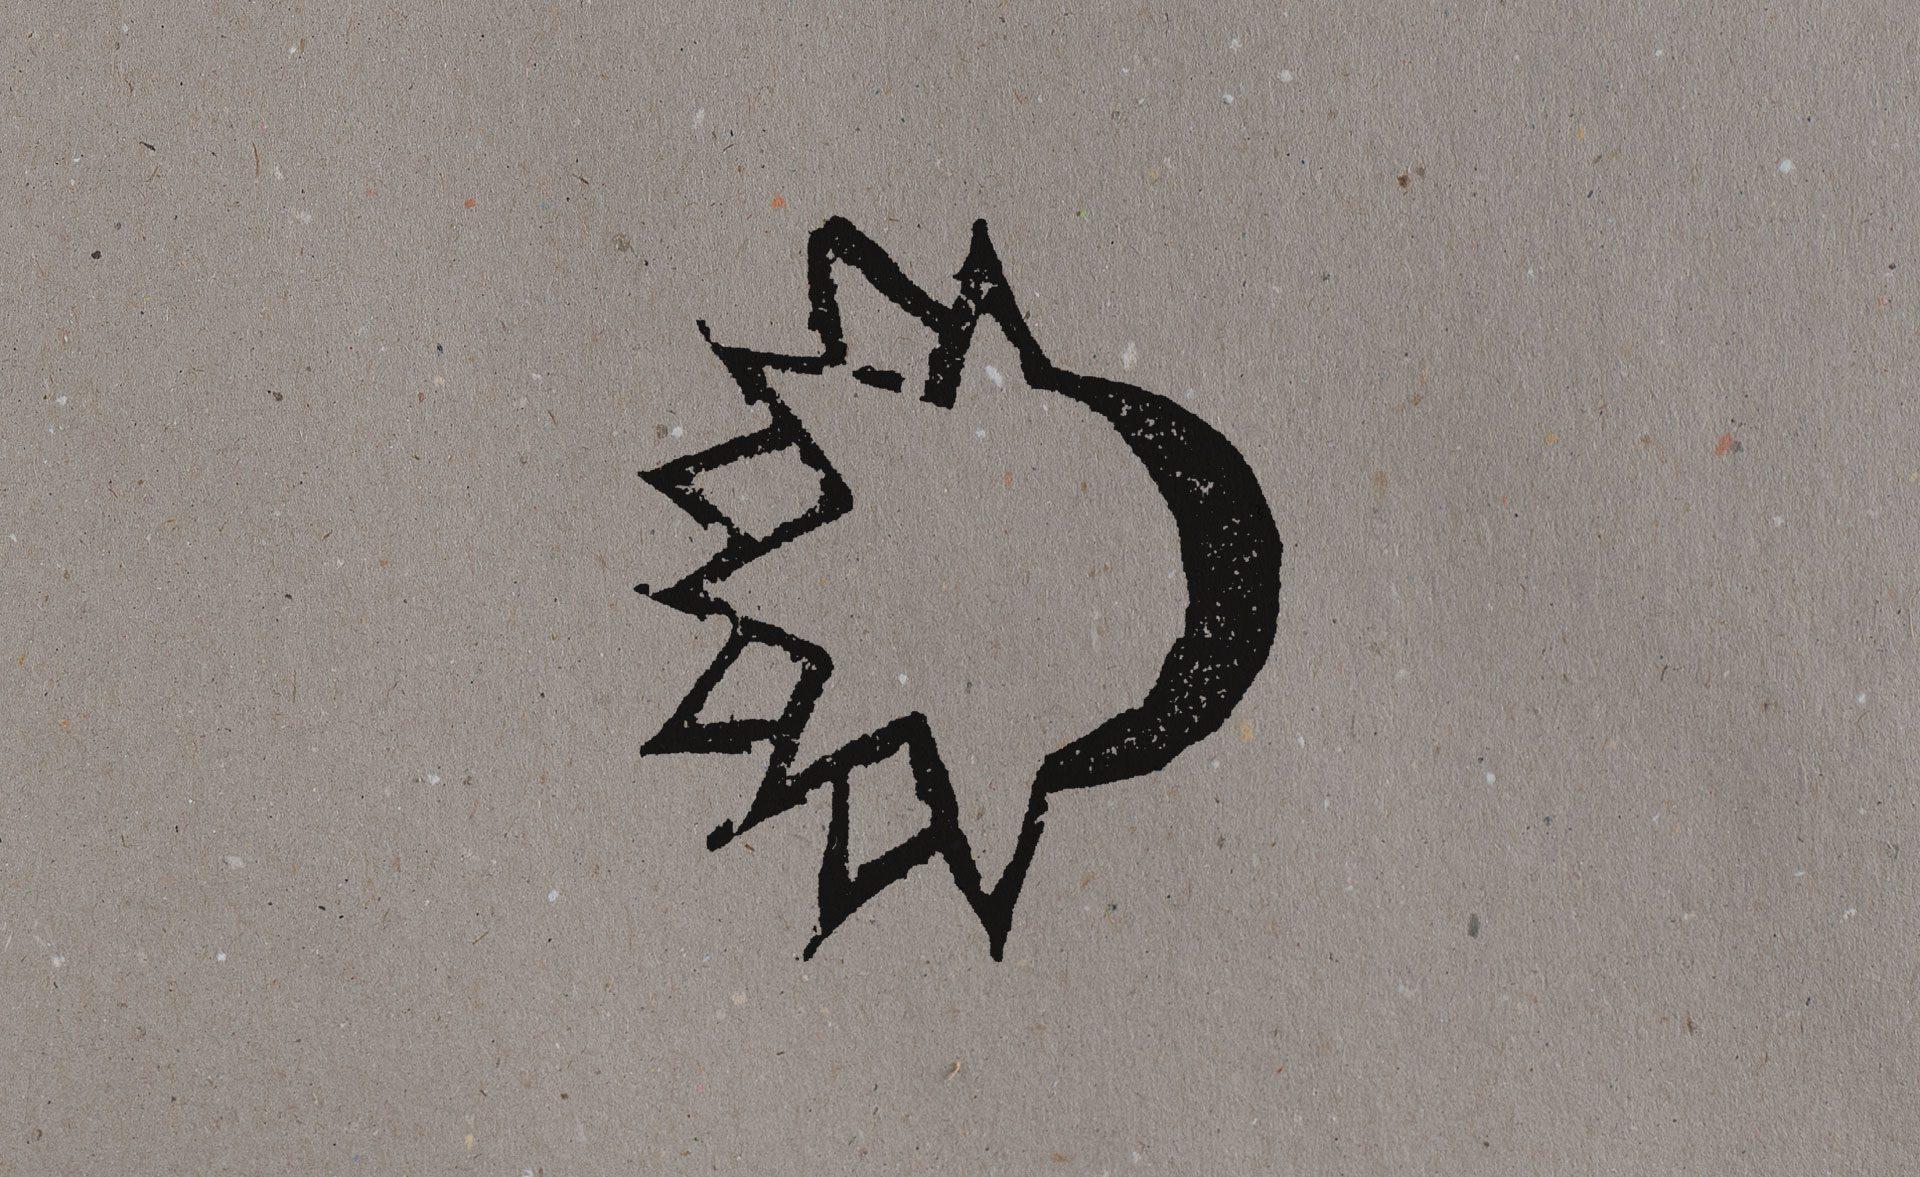 fond-papier-nuit-myrtide-logo-tampon-1920-01